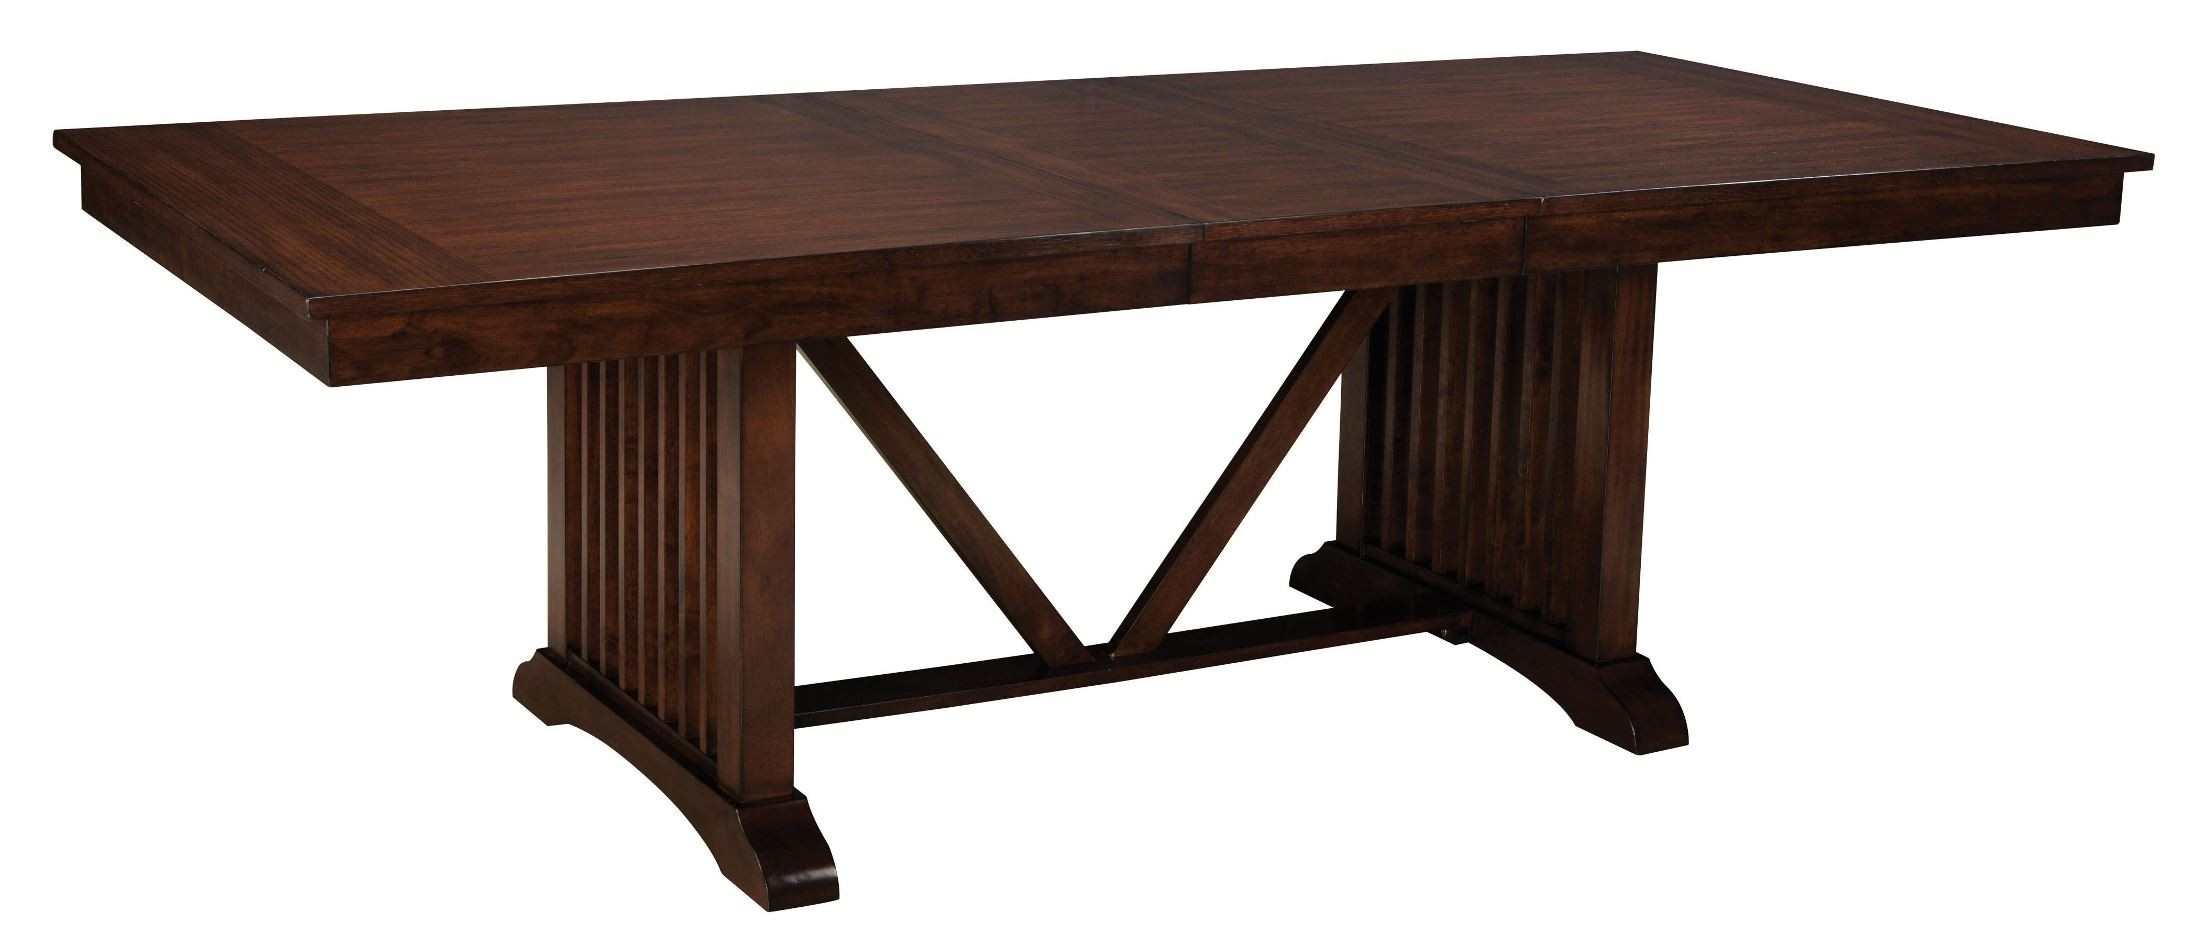 Artisan Loft Warm Medium Oak Rectangular Extendable Dining  : 1362013626trestletblsilo from colemanfurniture.com size 2200 x 939 jpeg 157kB